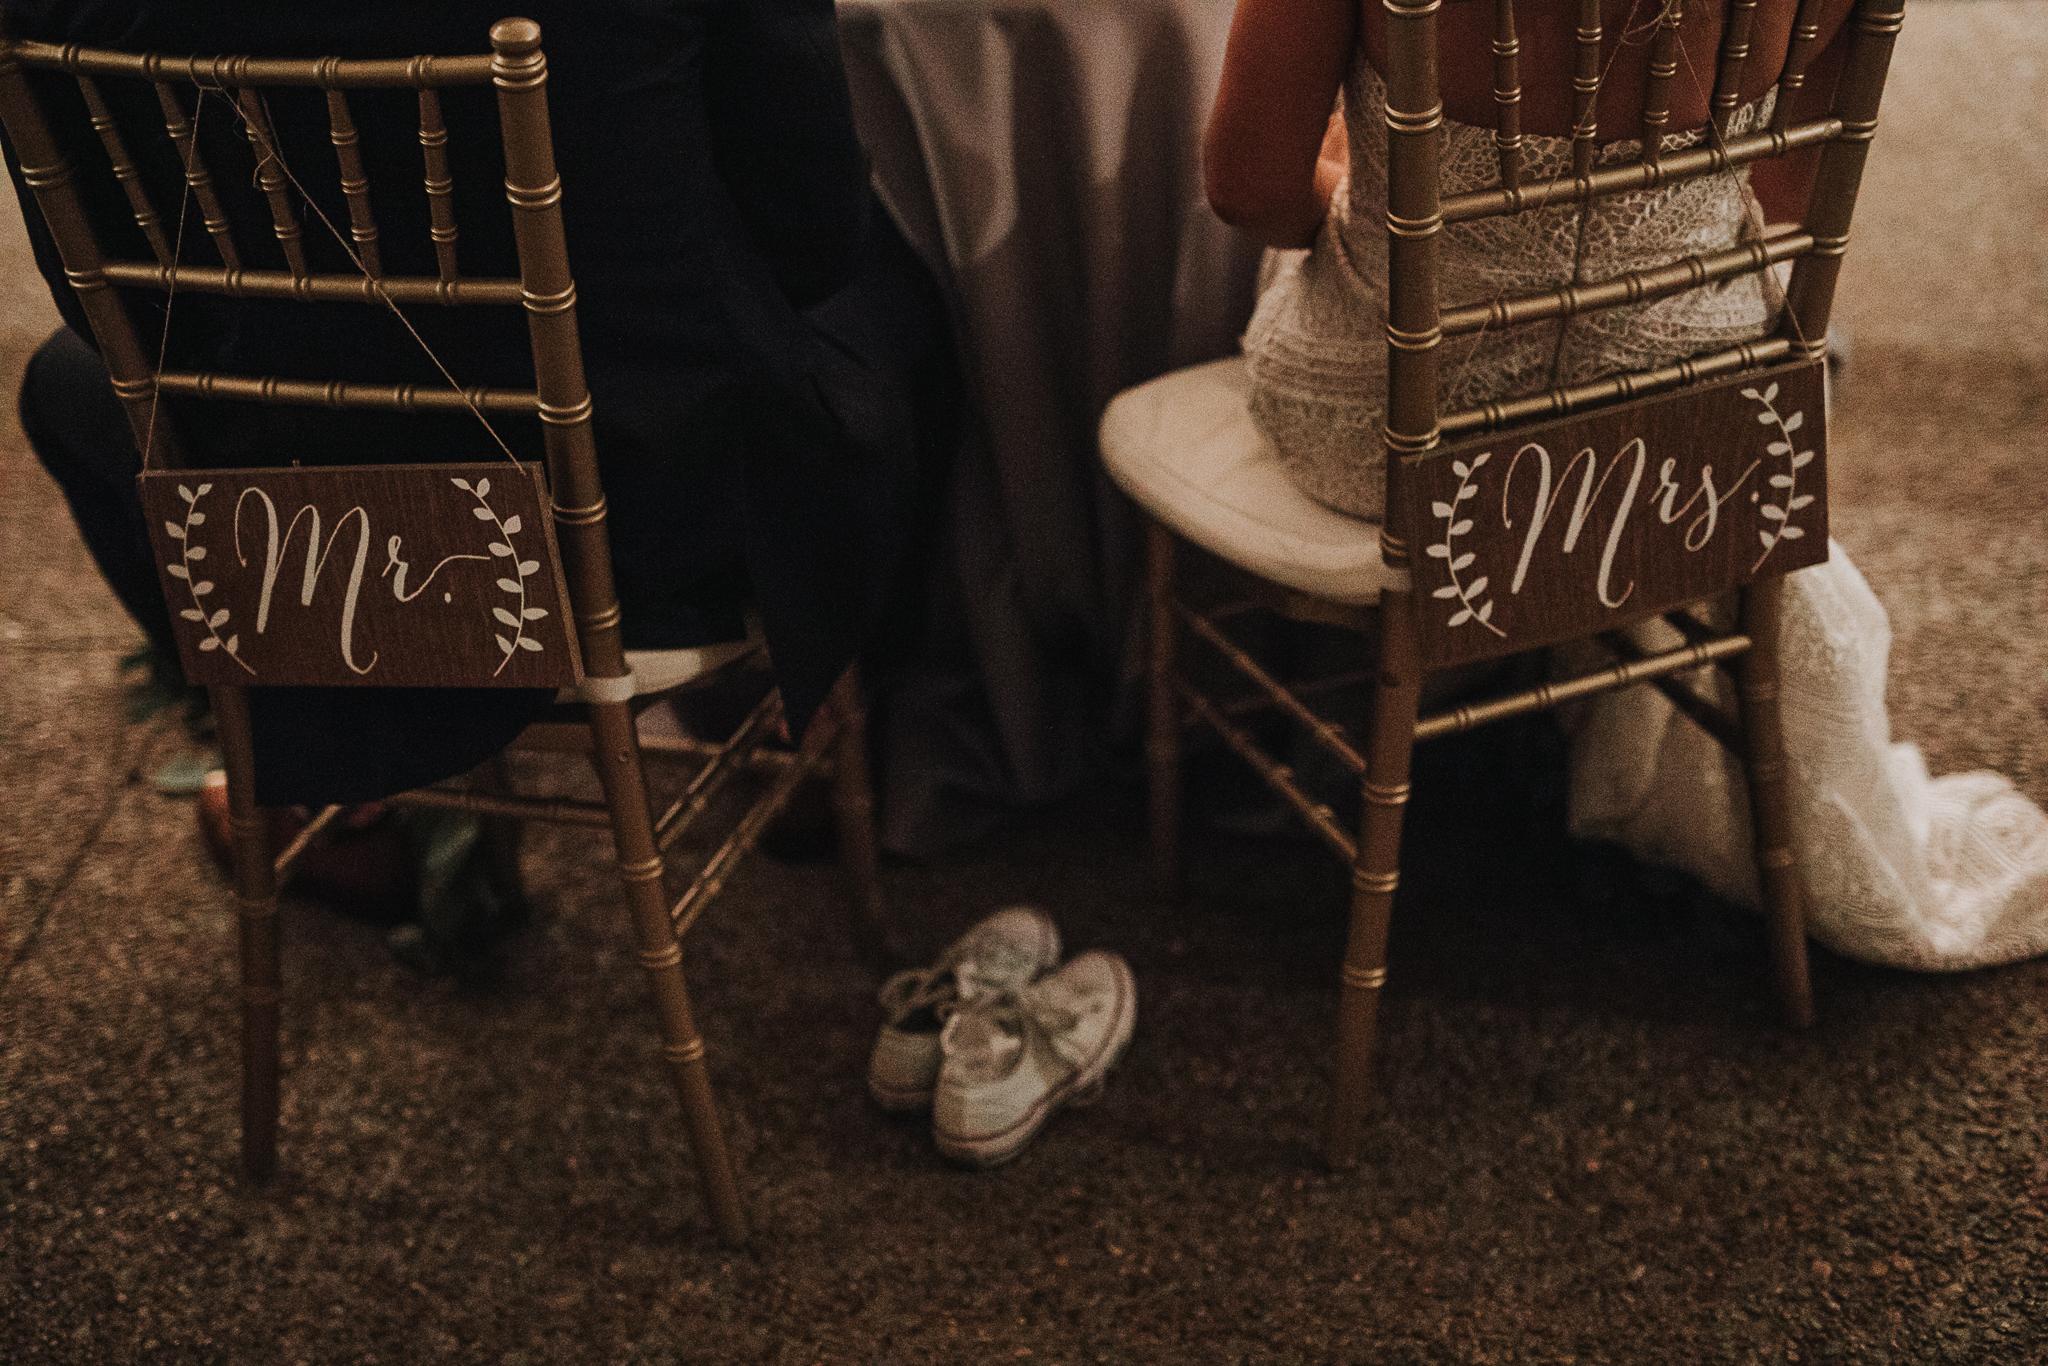 riverwood-mansion-wedding-photos-nashville-tn-7.jpg